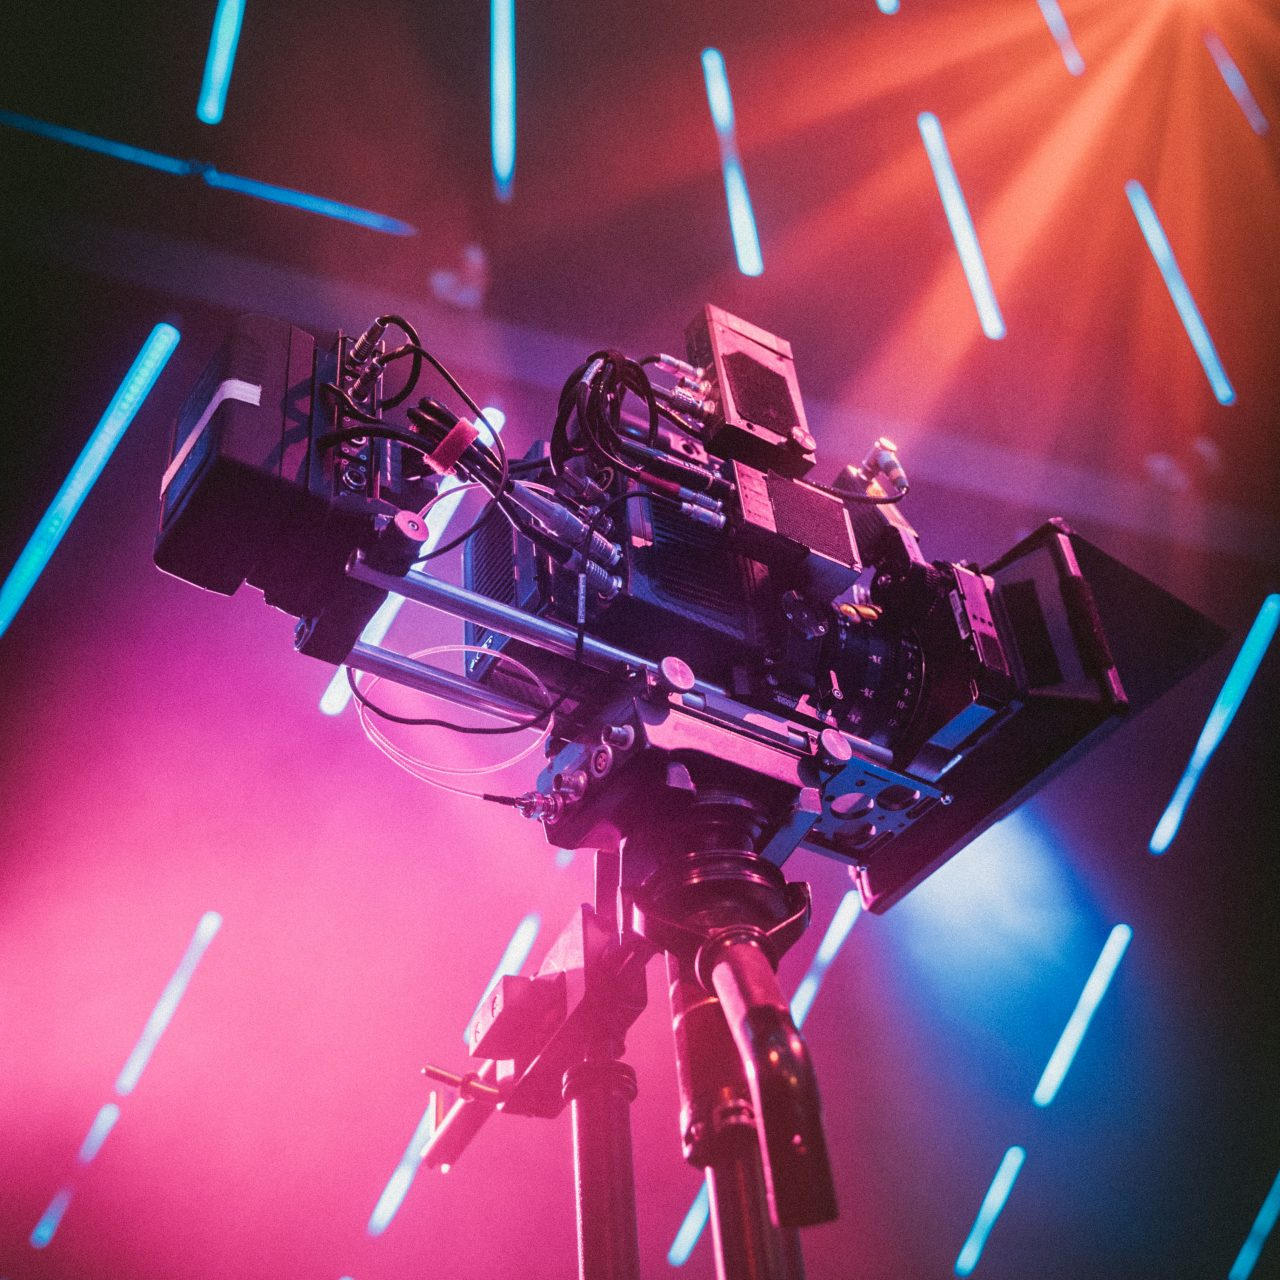 Tanıtım filmi kamera